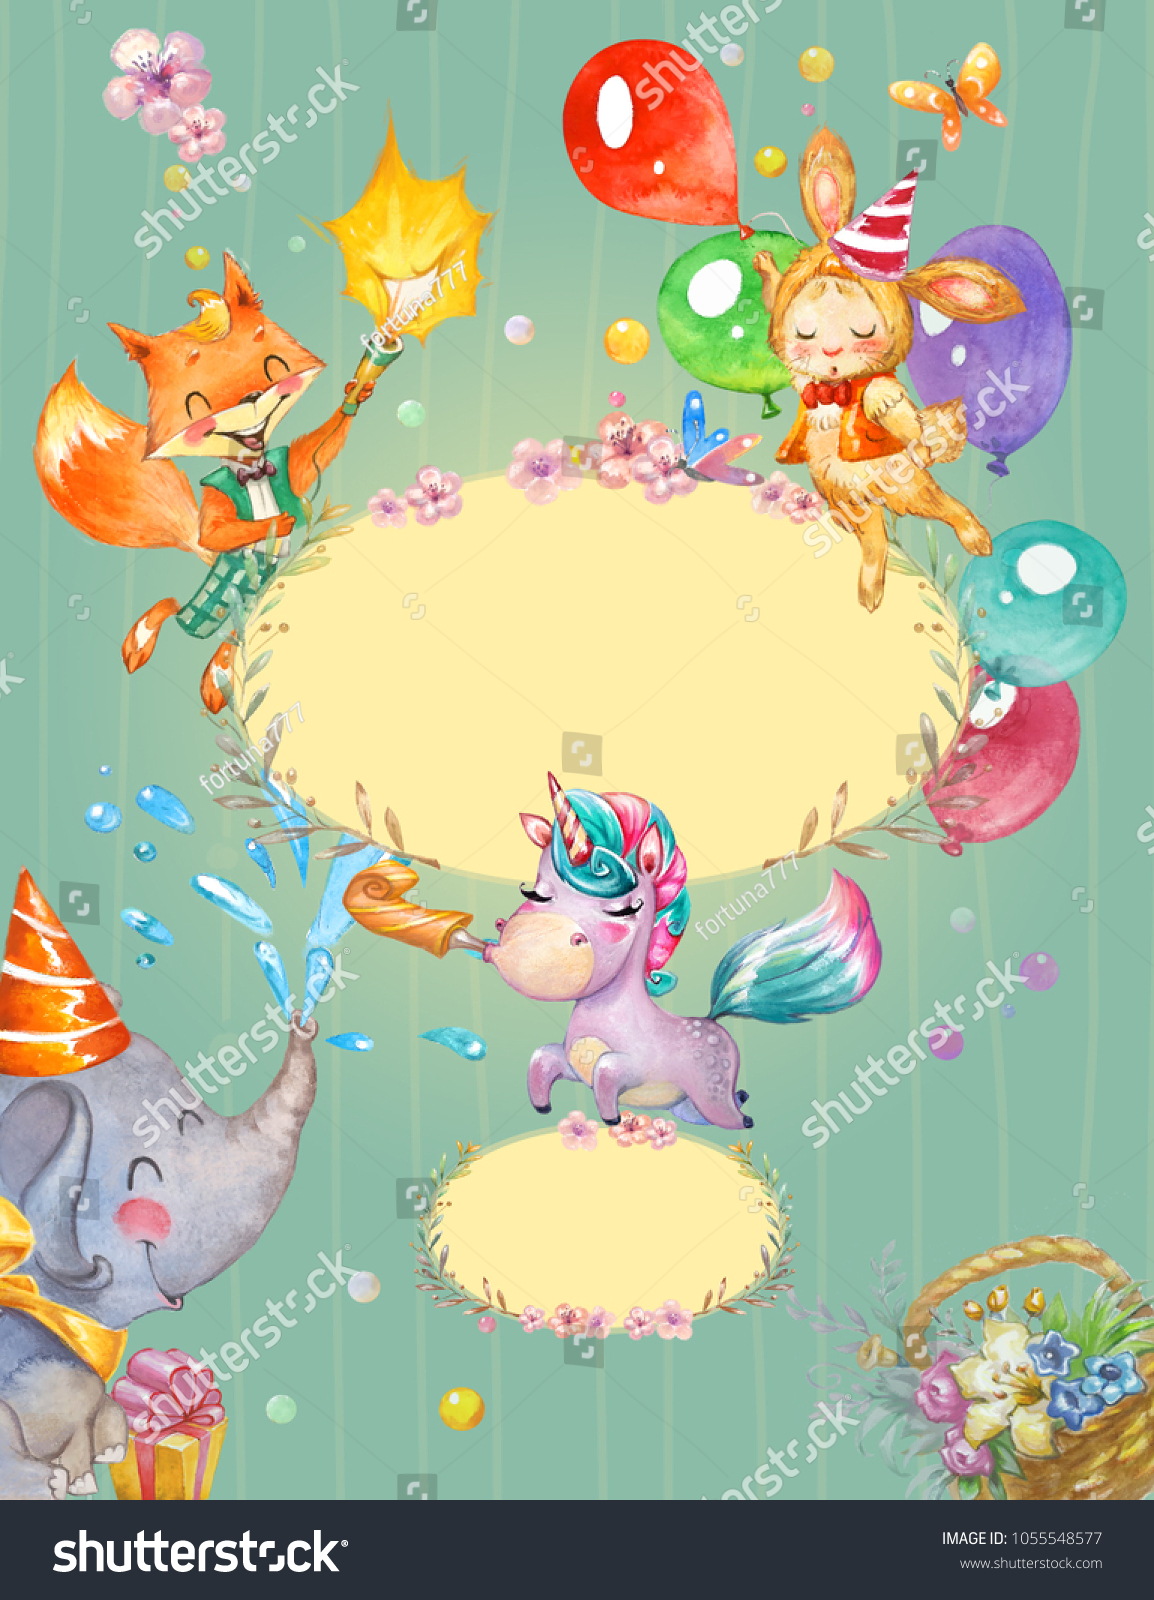 Children Birthday Party Invitation Background Watercolor Stock ...